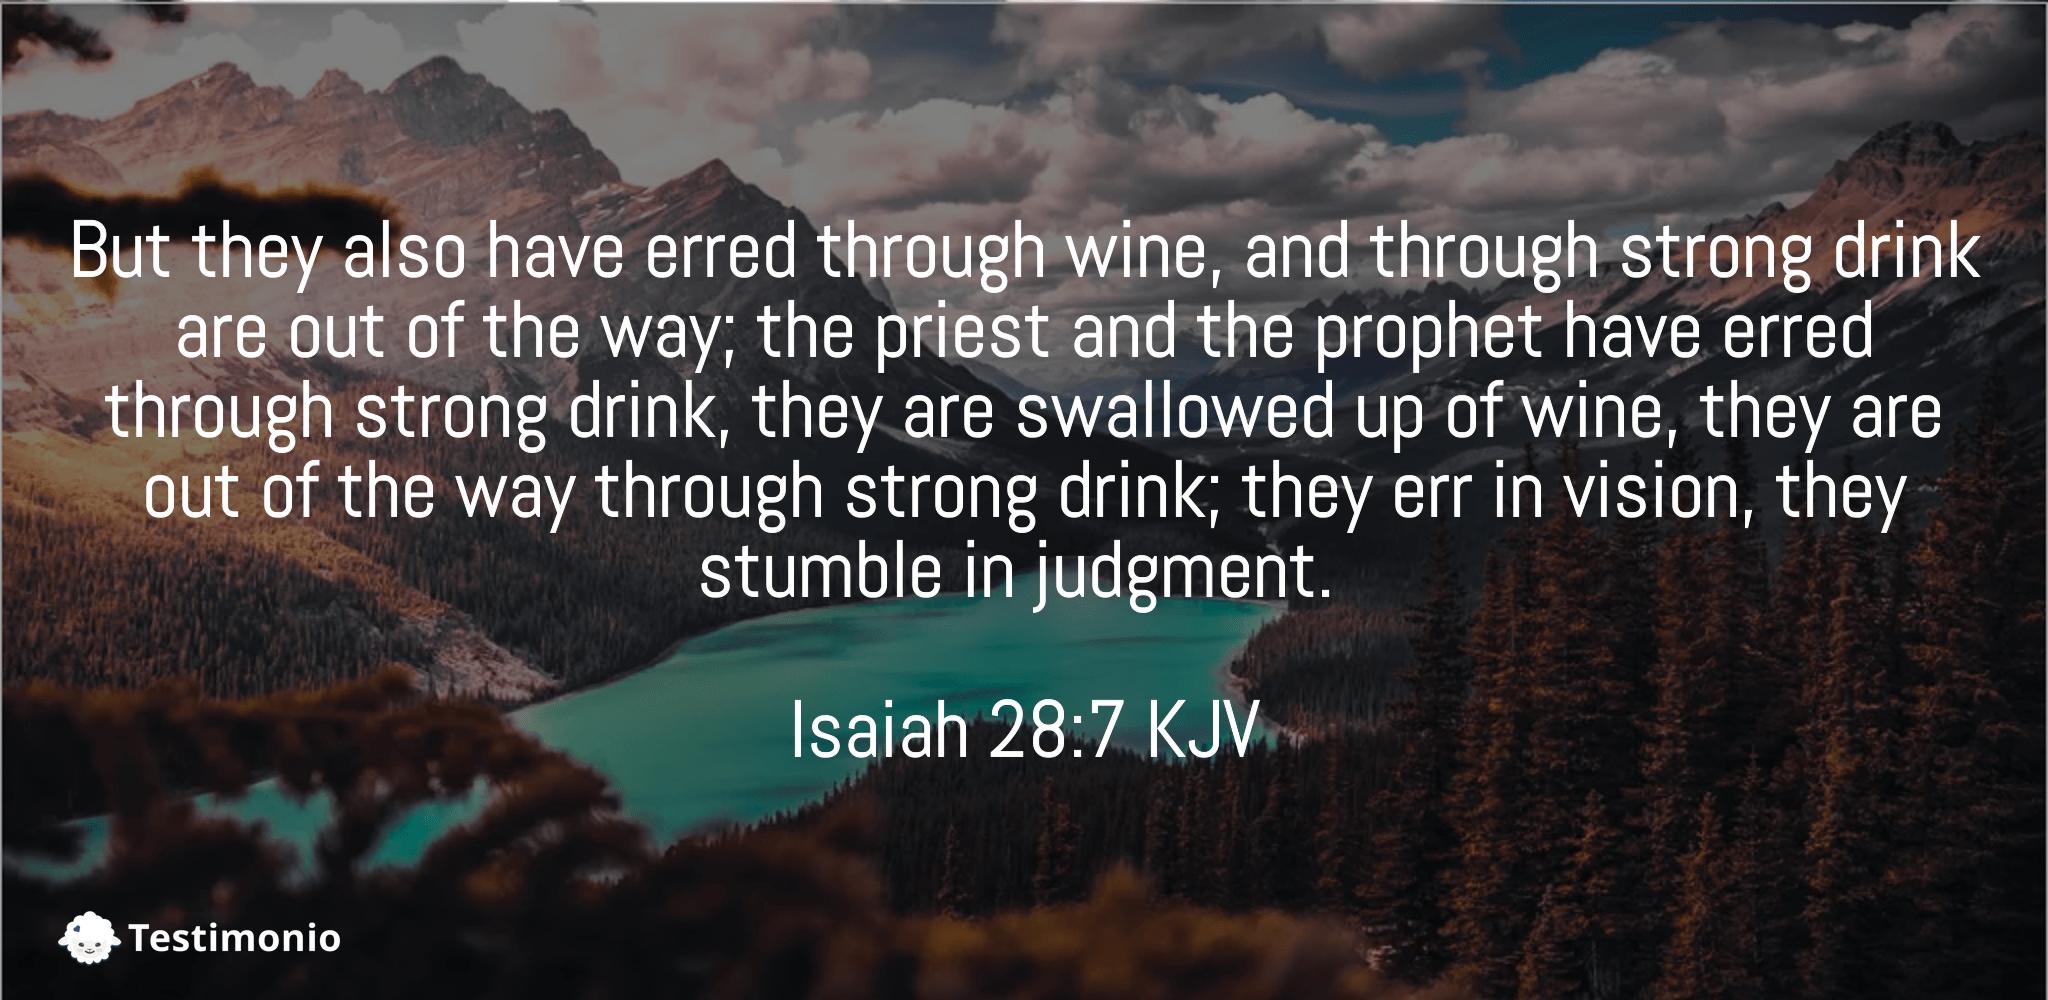 Isaiah 28:7